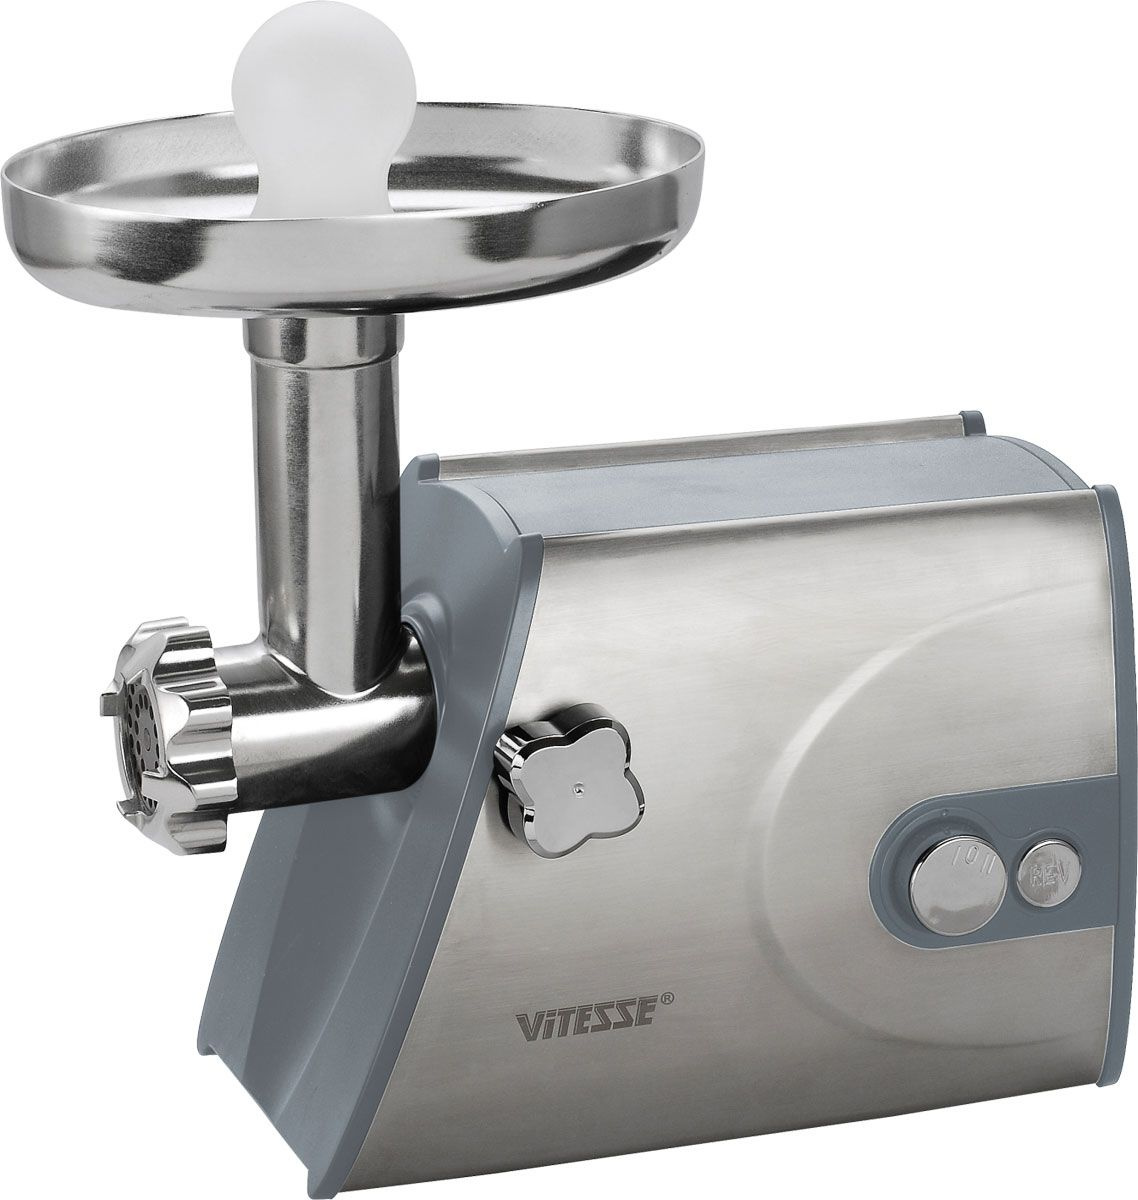 Мясорубка Vitesse VS-701 #1